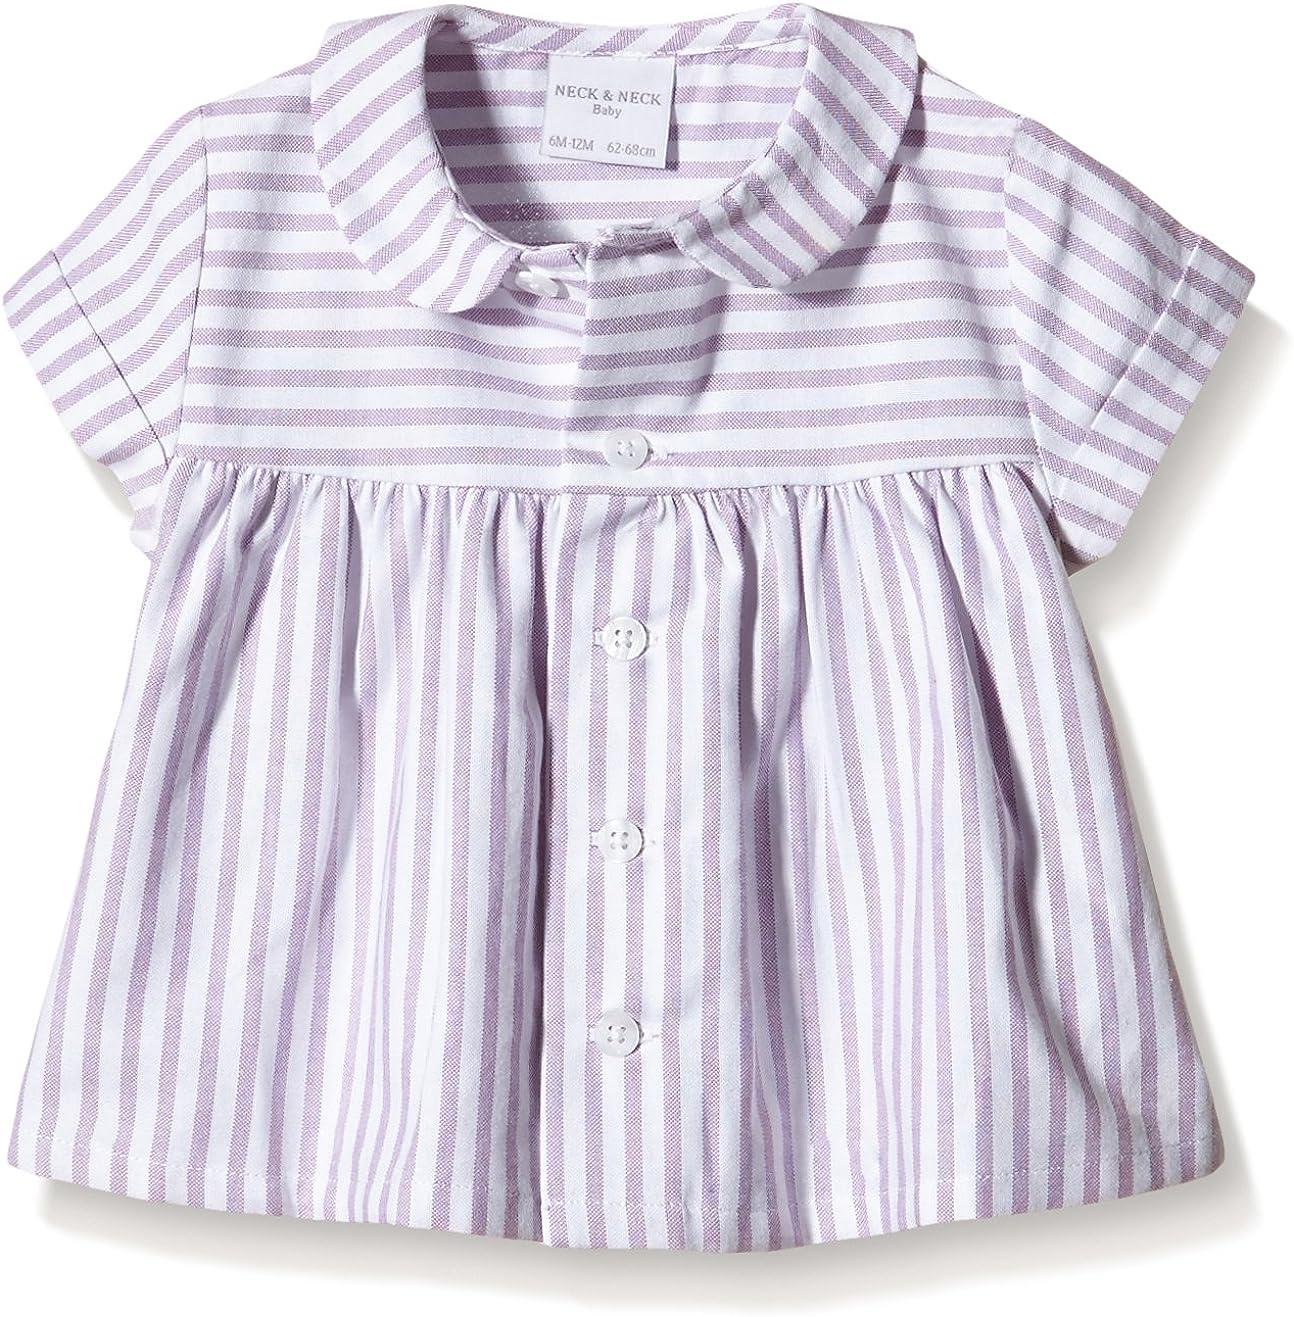 neck & neck Camisa Bebe, Pink-Mauve/Rosa Malva 36, 12M ...